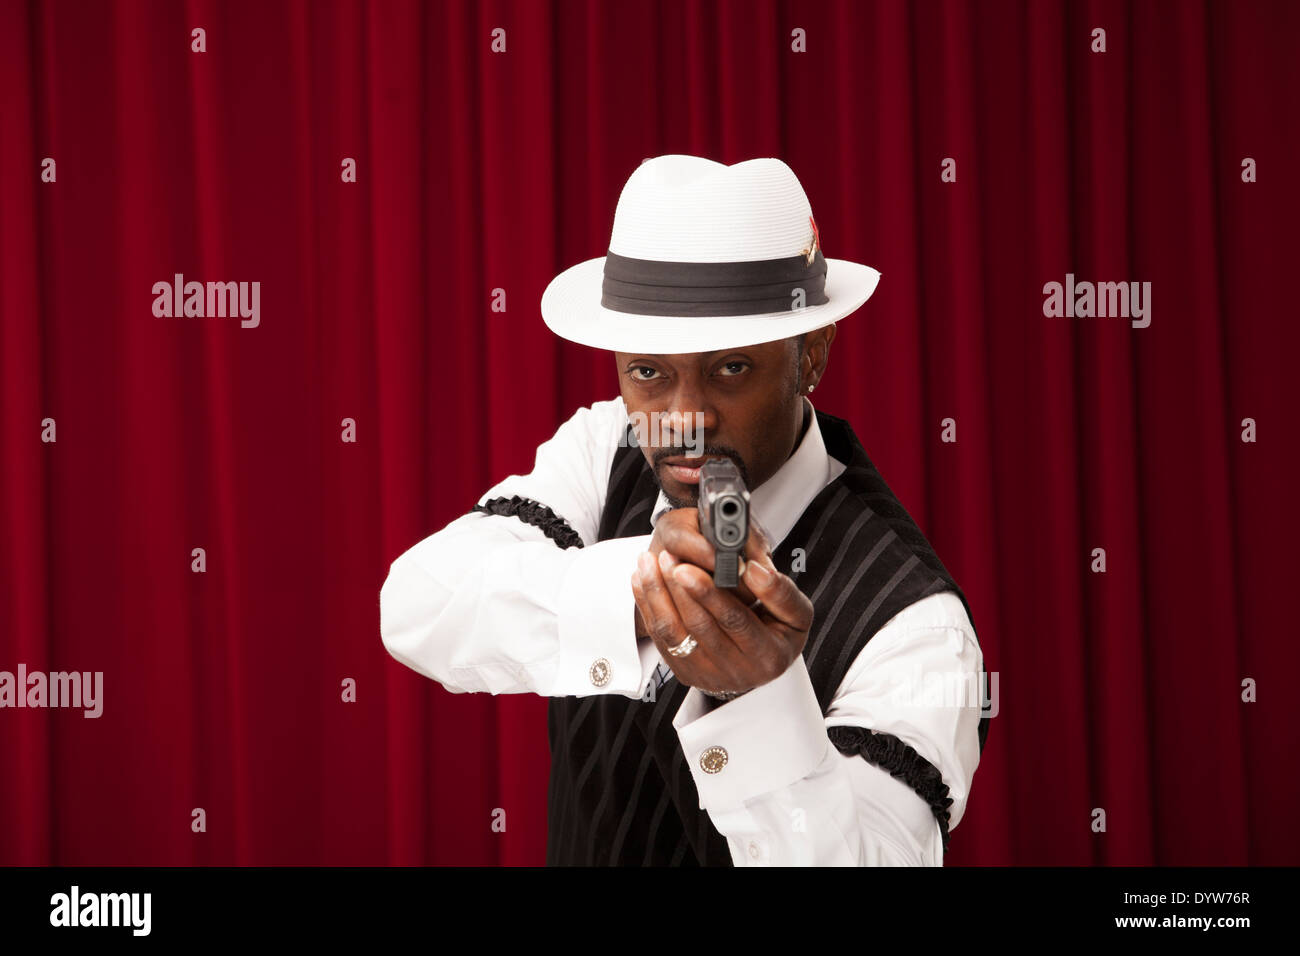 african american gambler dressed in retro mobster suit pointing gun - Stock Image